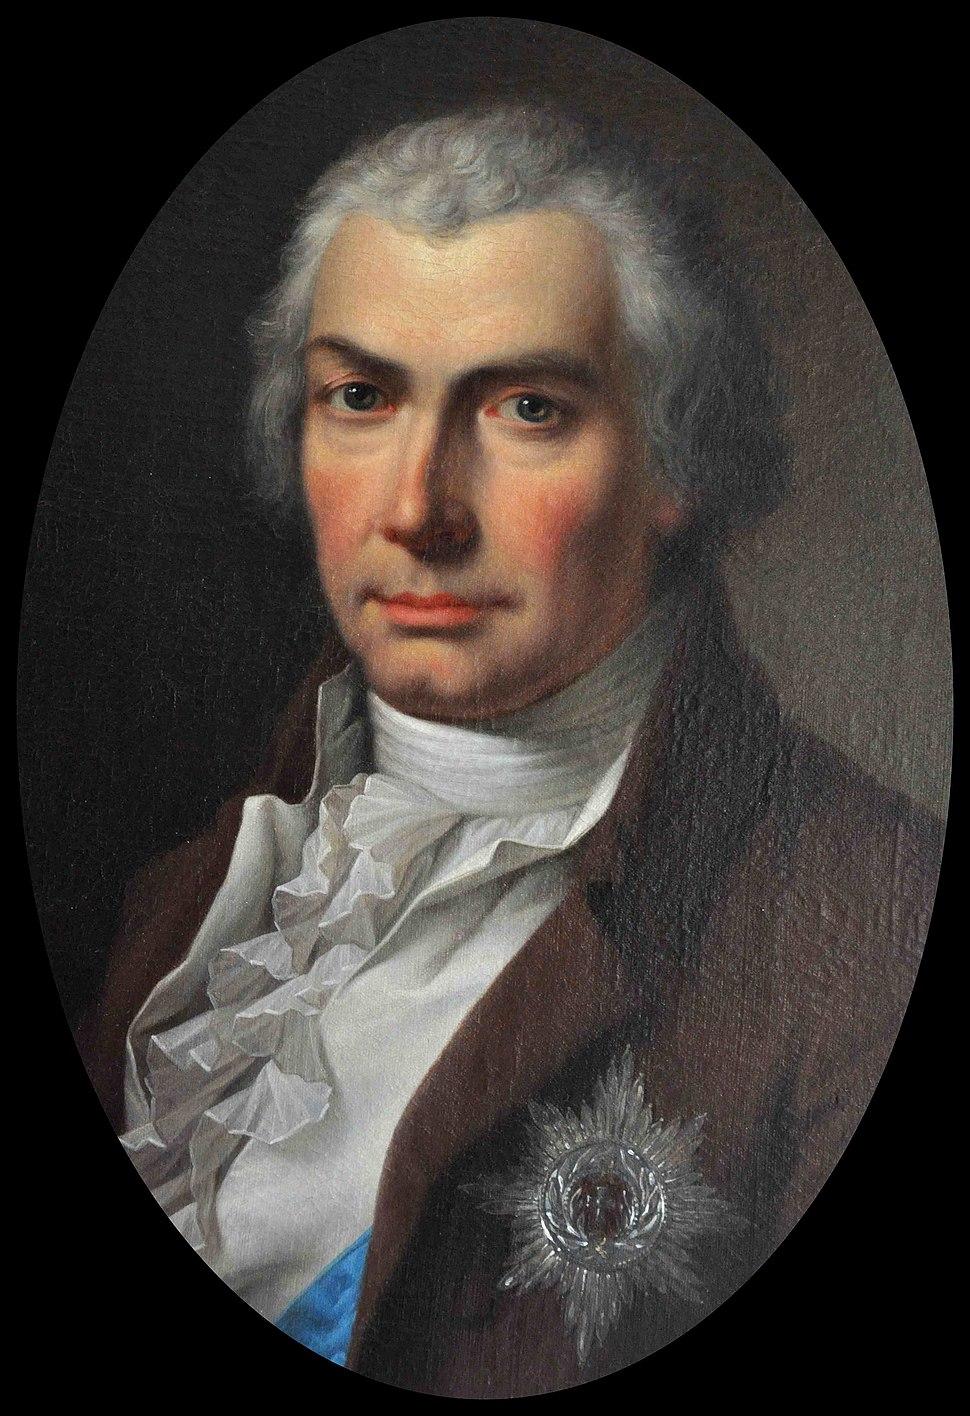 Christian Ditlev Frederik Reventlow, Prime minister and reformer